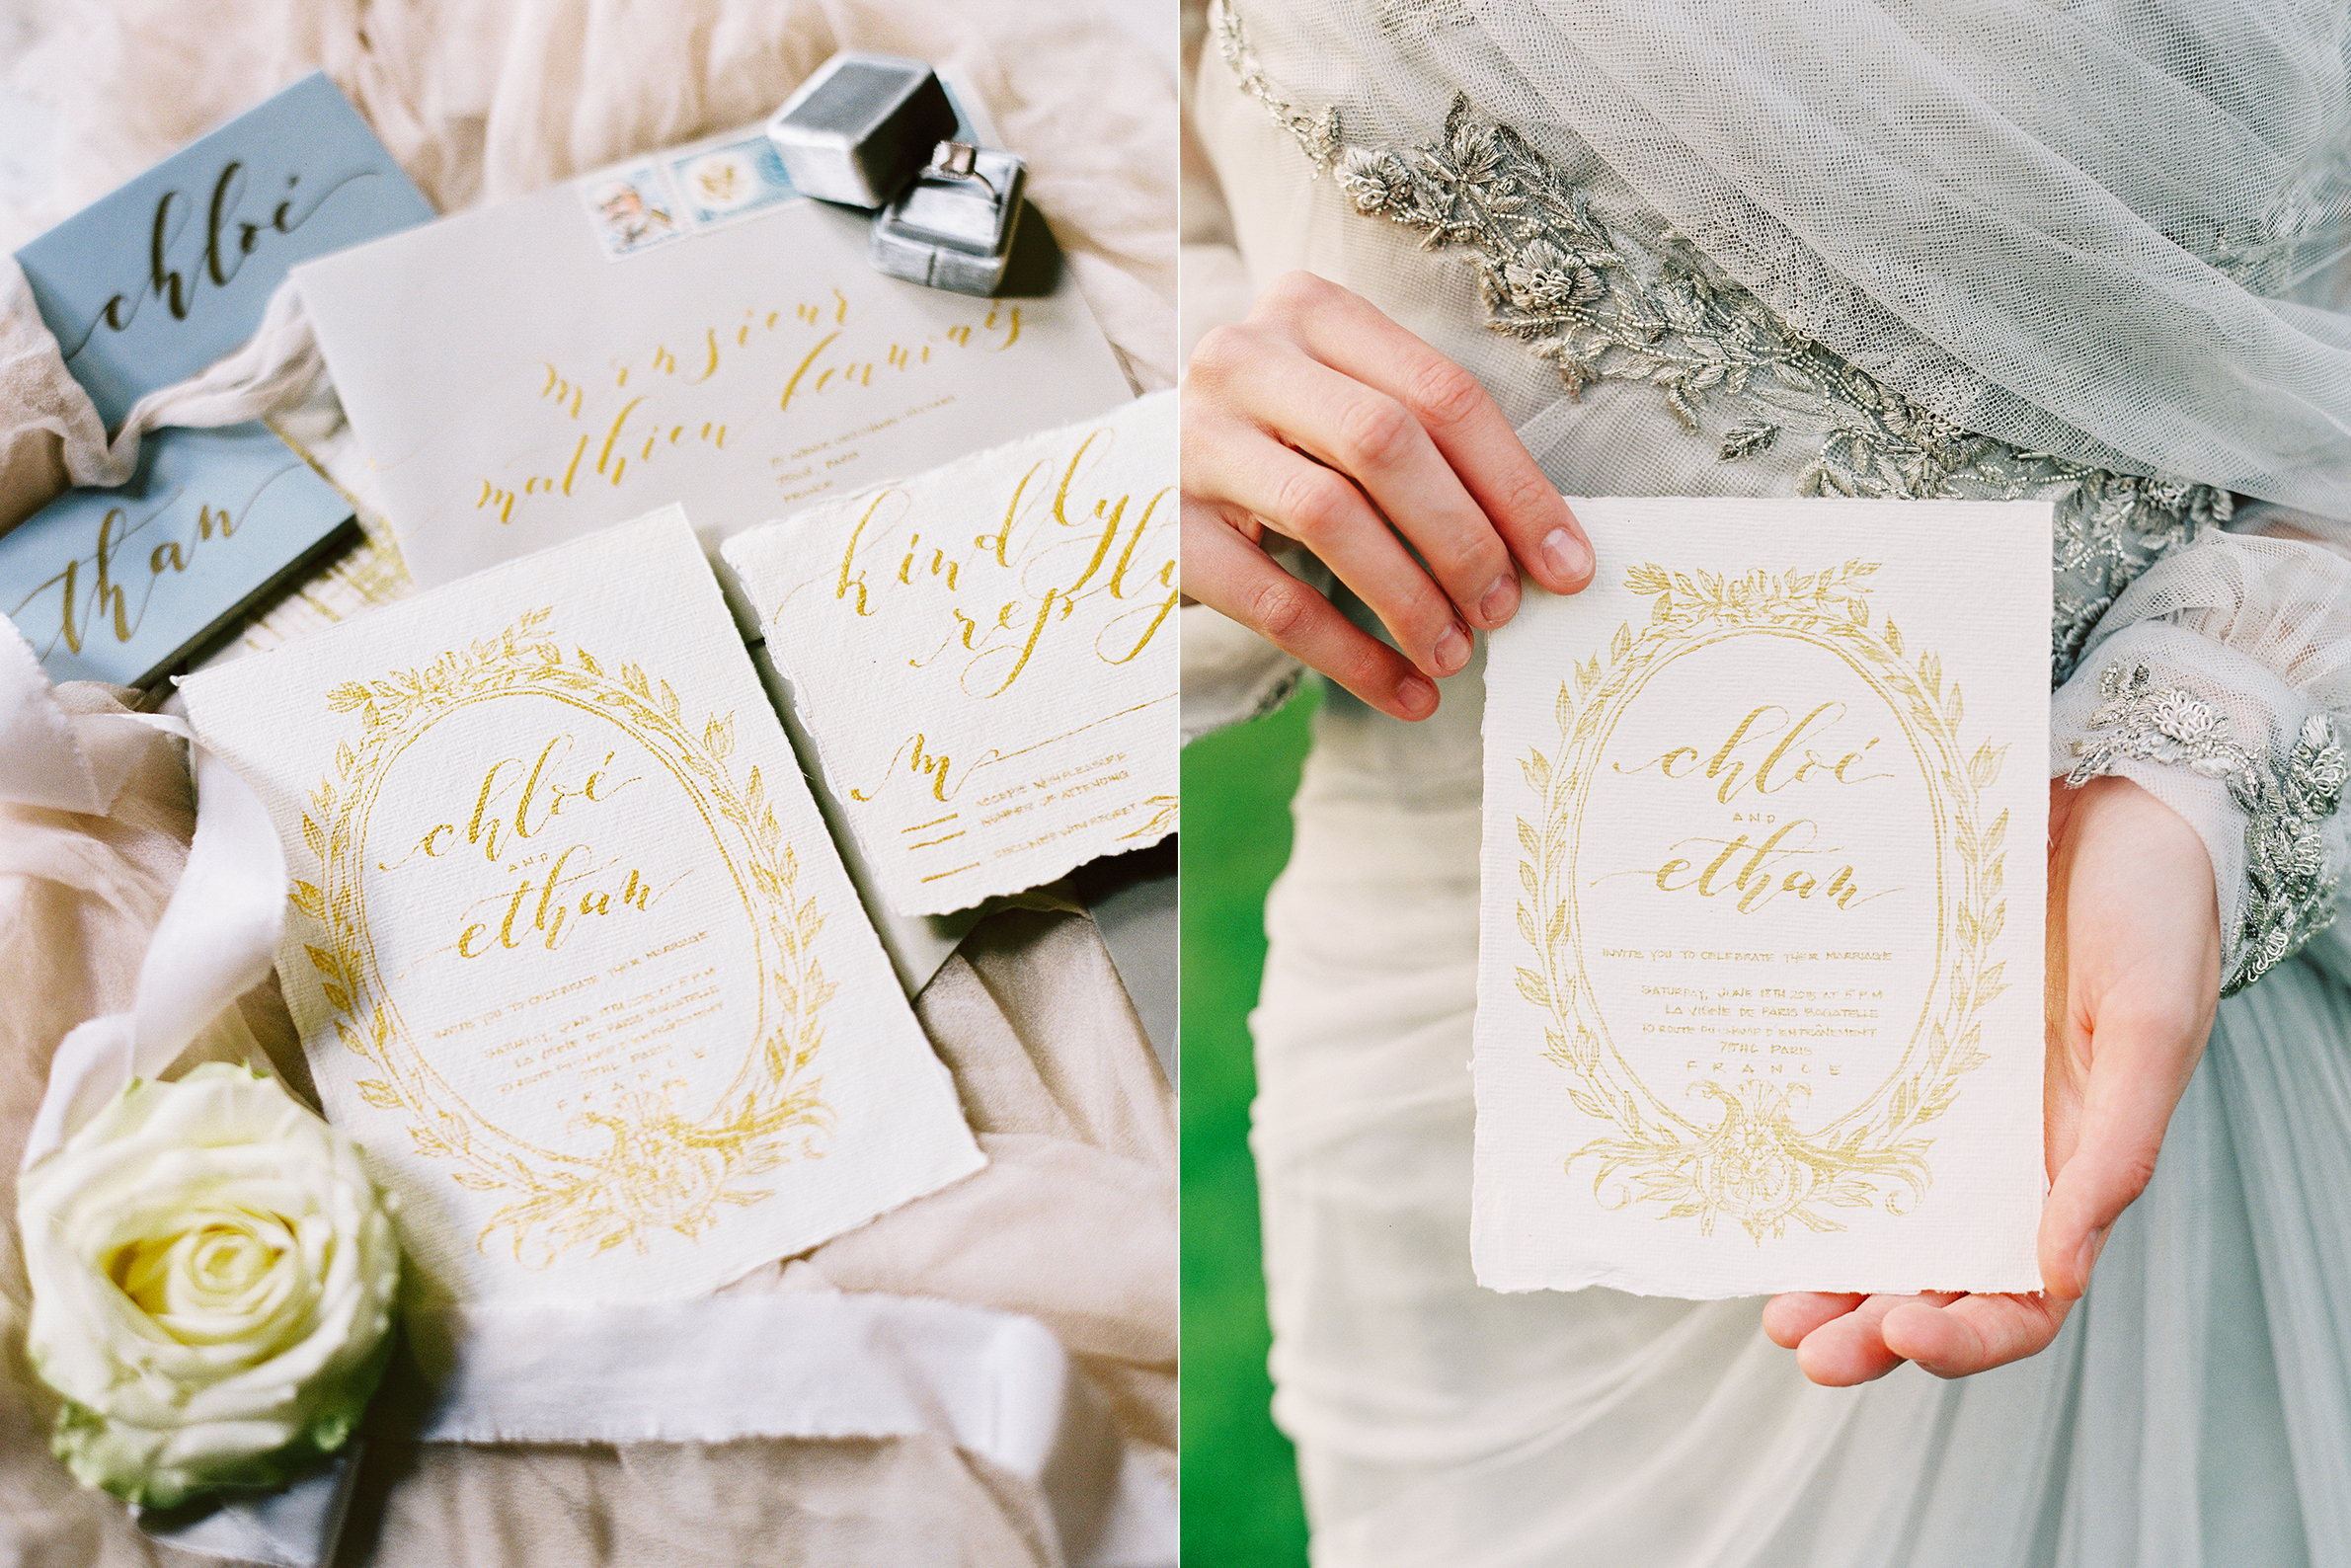 katie stoops photography-paris wedding-marchesa-cynthia martyn events06.jpg